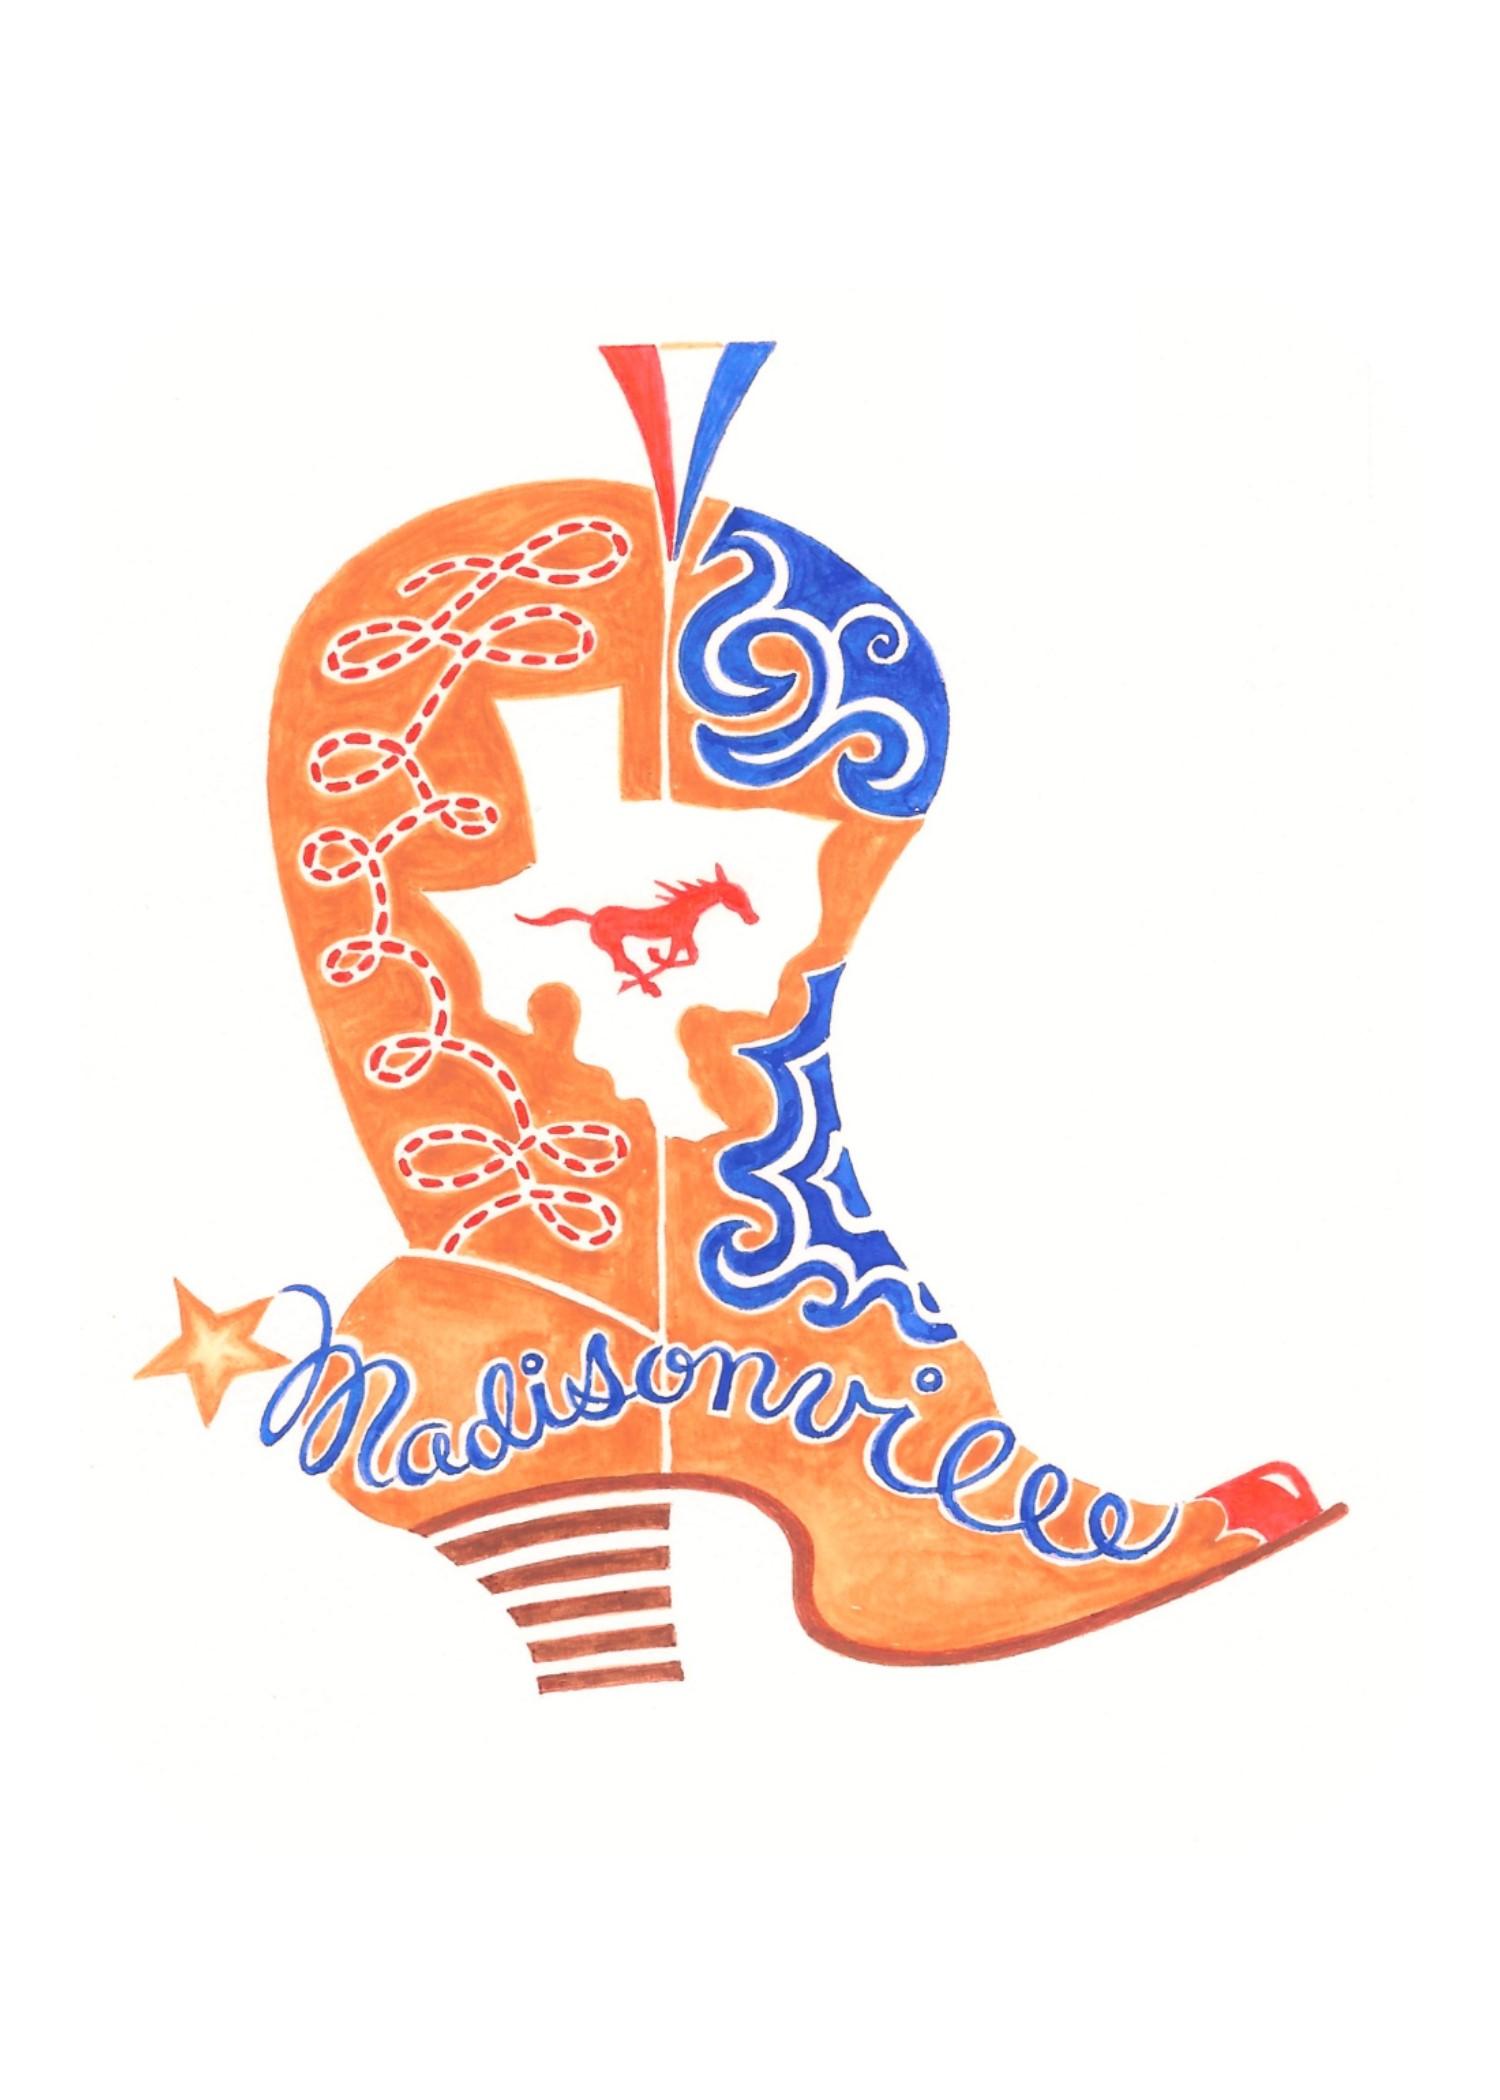 Madisonville Boot